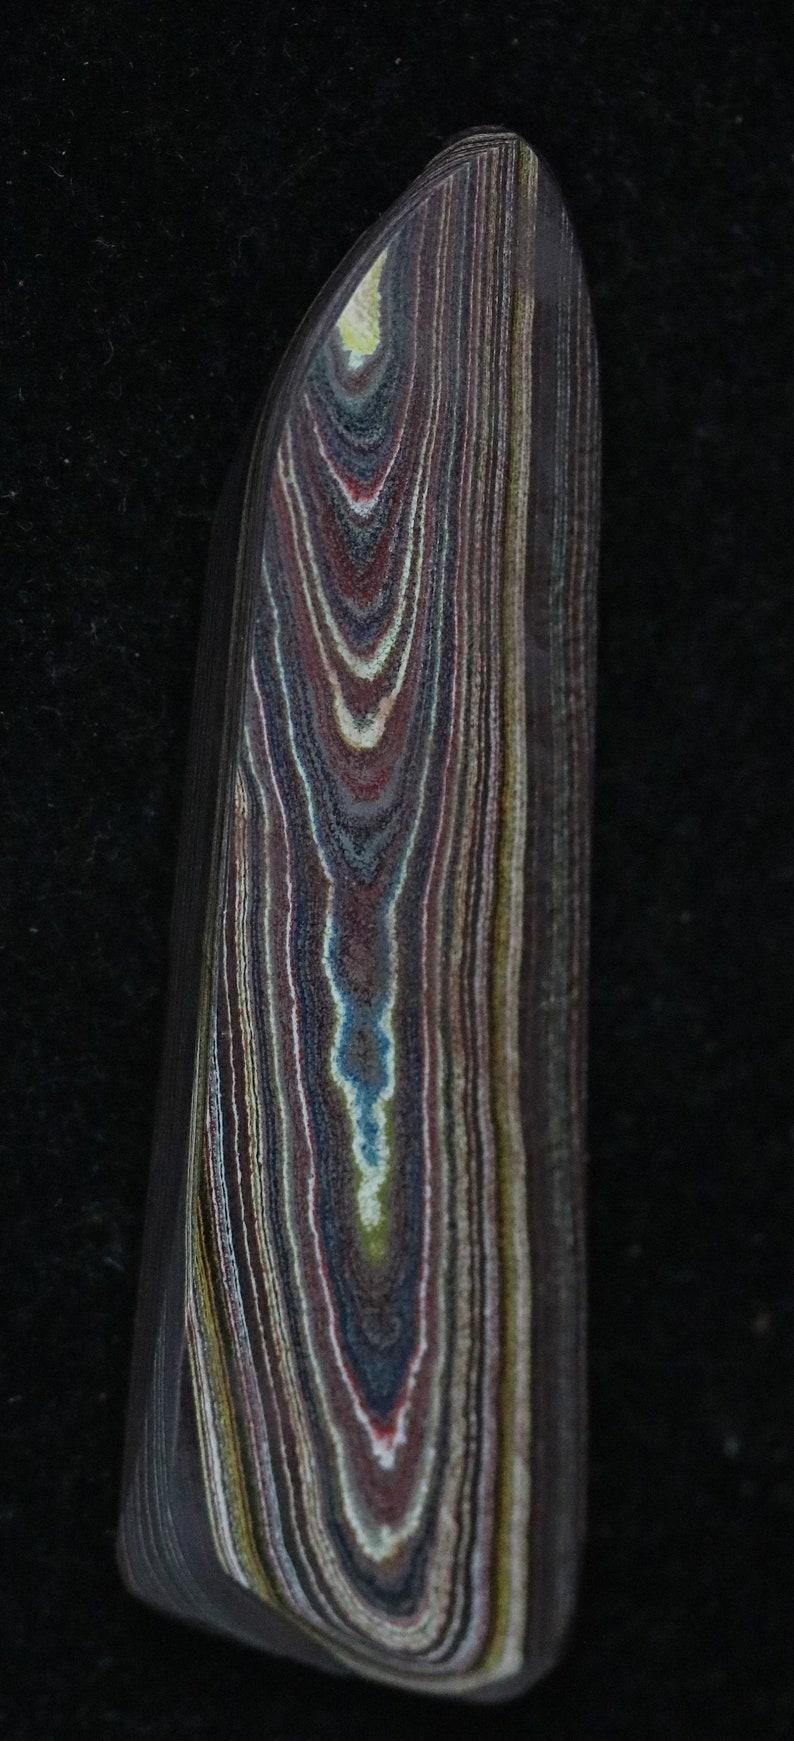 Corvettite cabochon 30.5ct; ETSY RANK #3 Corvettite Cabochon black brown yellow gray green blue redmarooncarmine